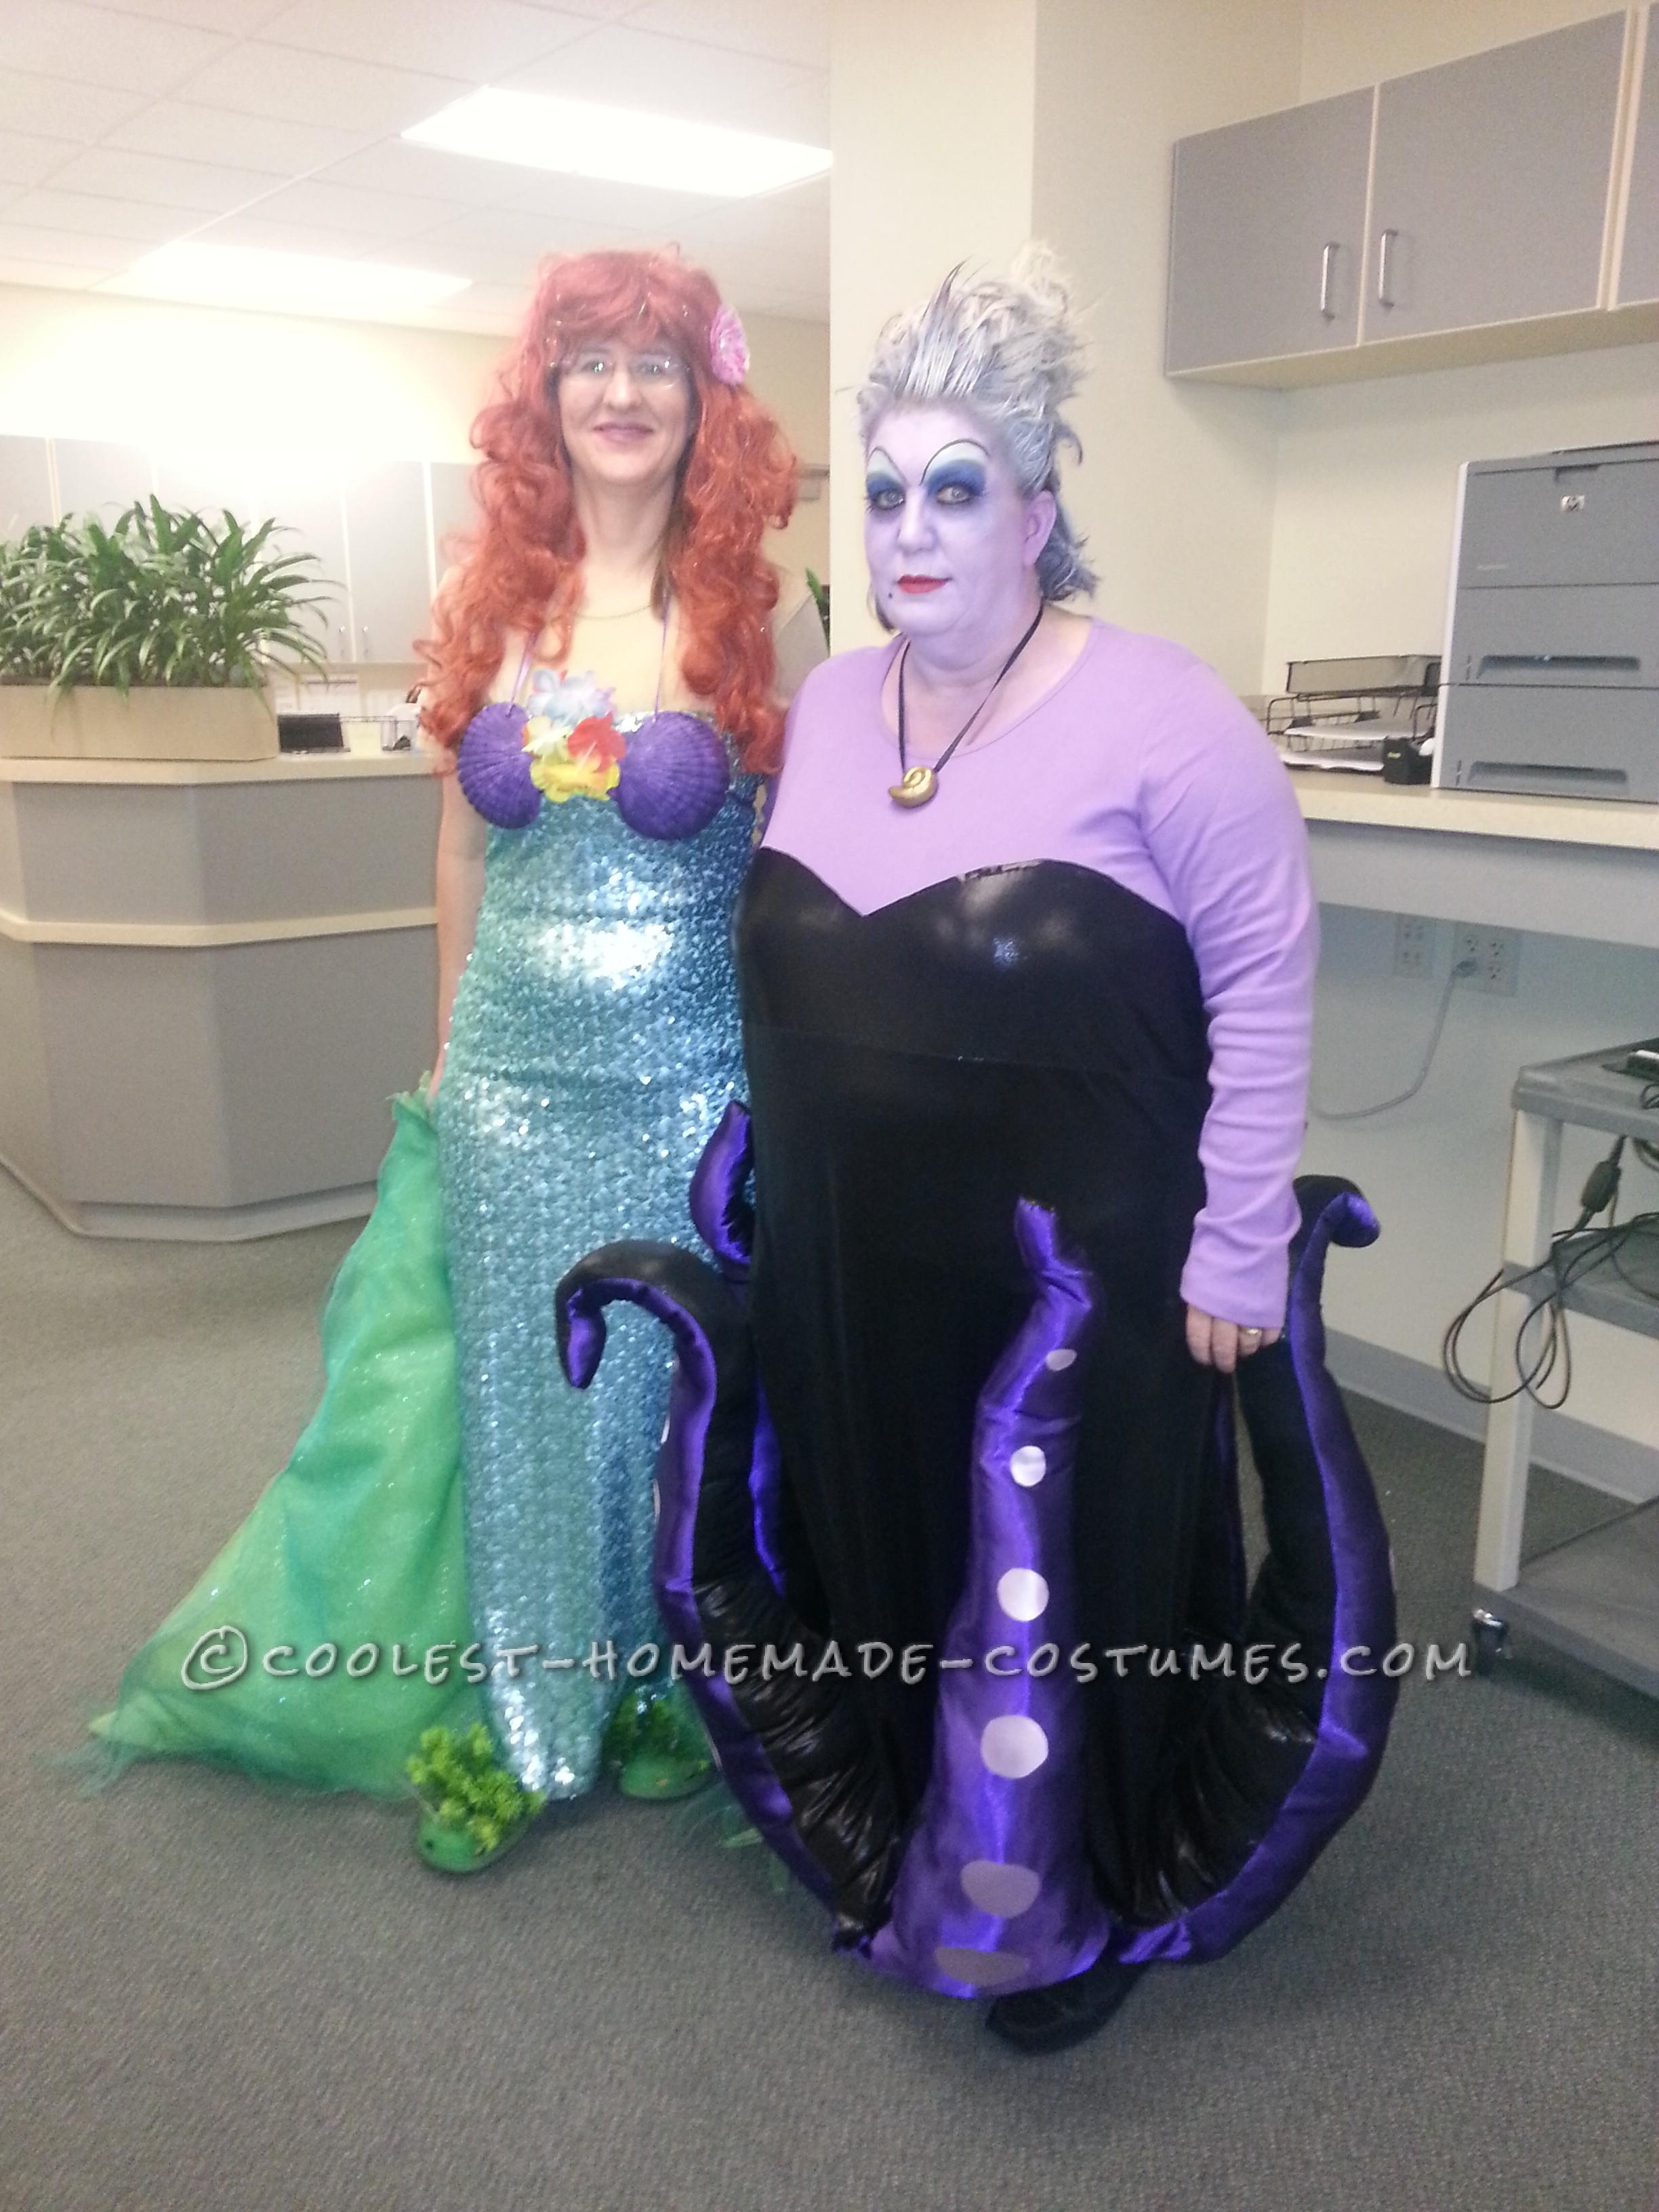 Disney Villain Halloween Costumes Diy.Diy Plus Size Disney Costumes Diy Campbellandkellarteam